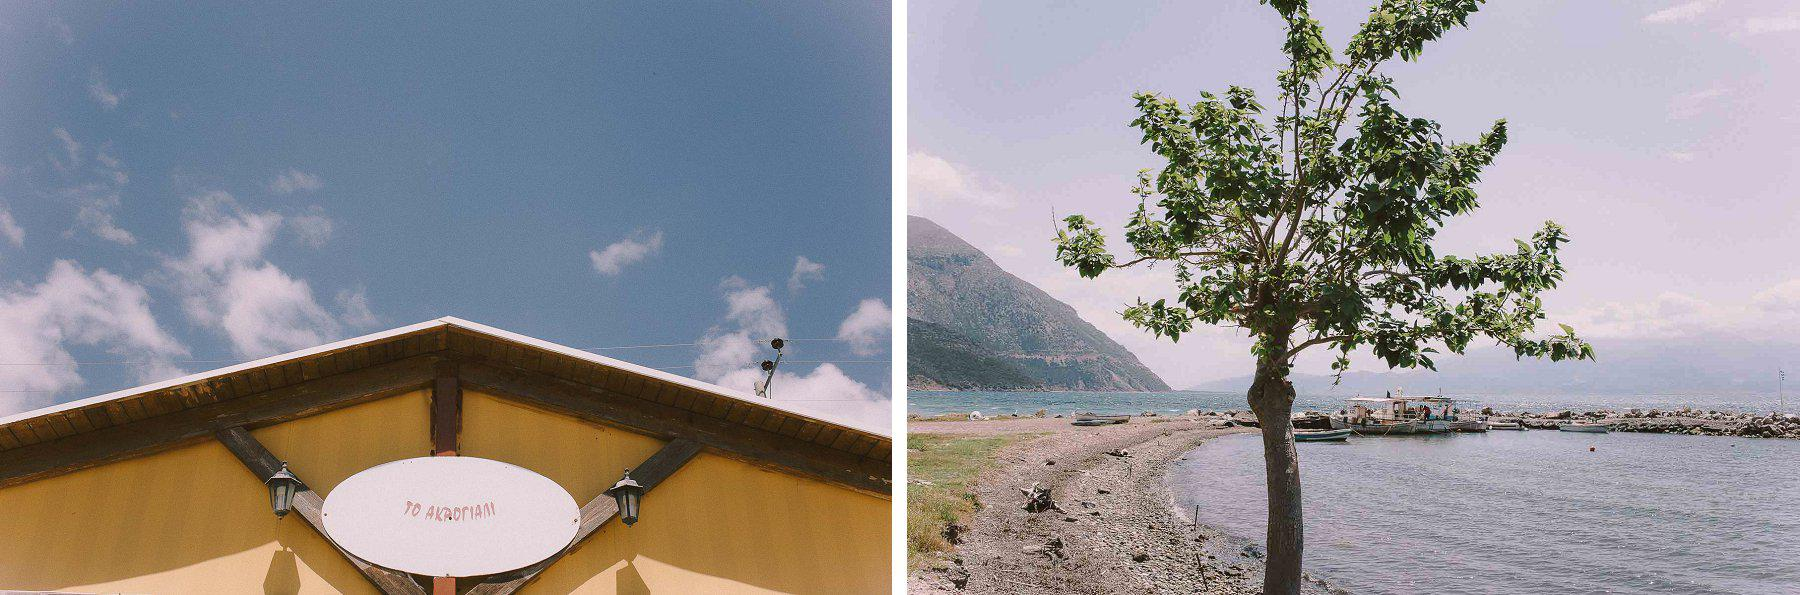 destination-wedding-in-lake-aitoliko-messolonghi-in-greece044